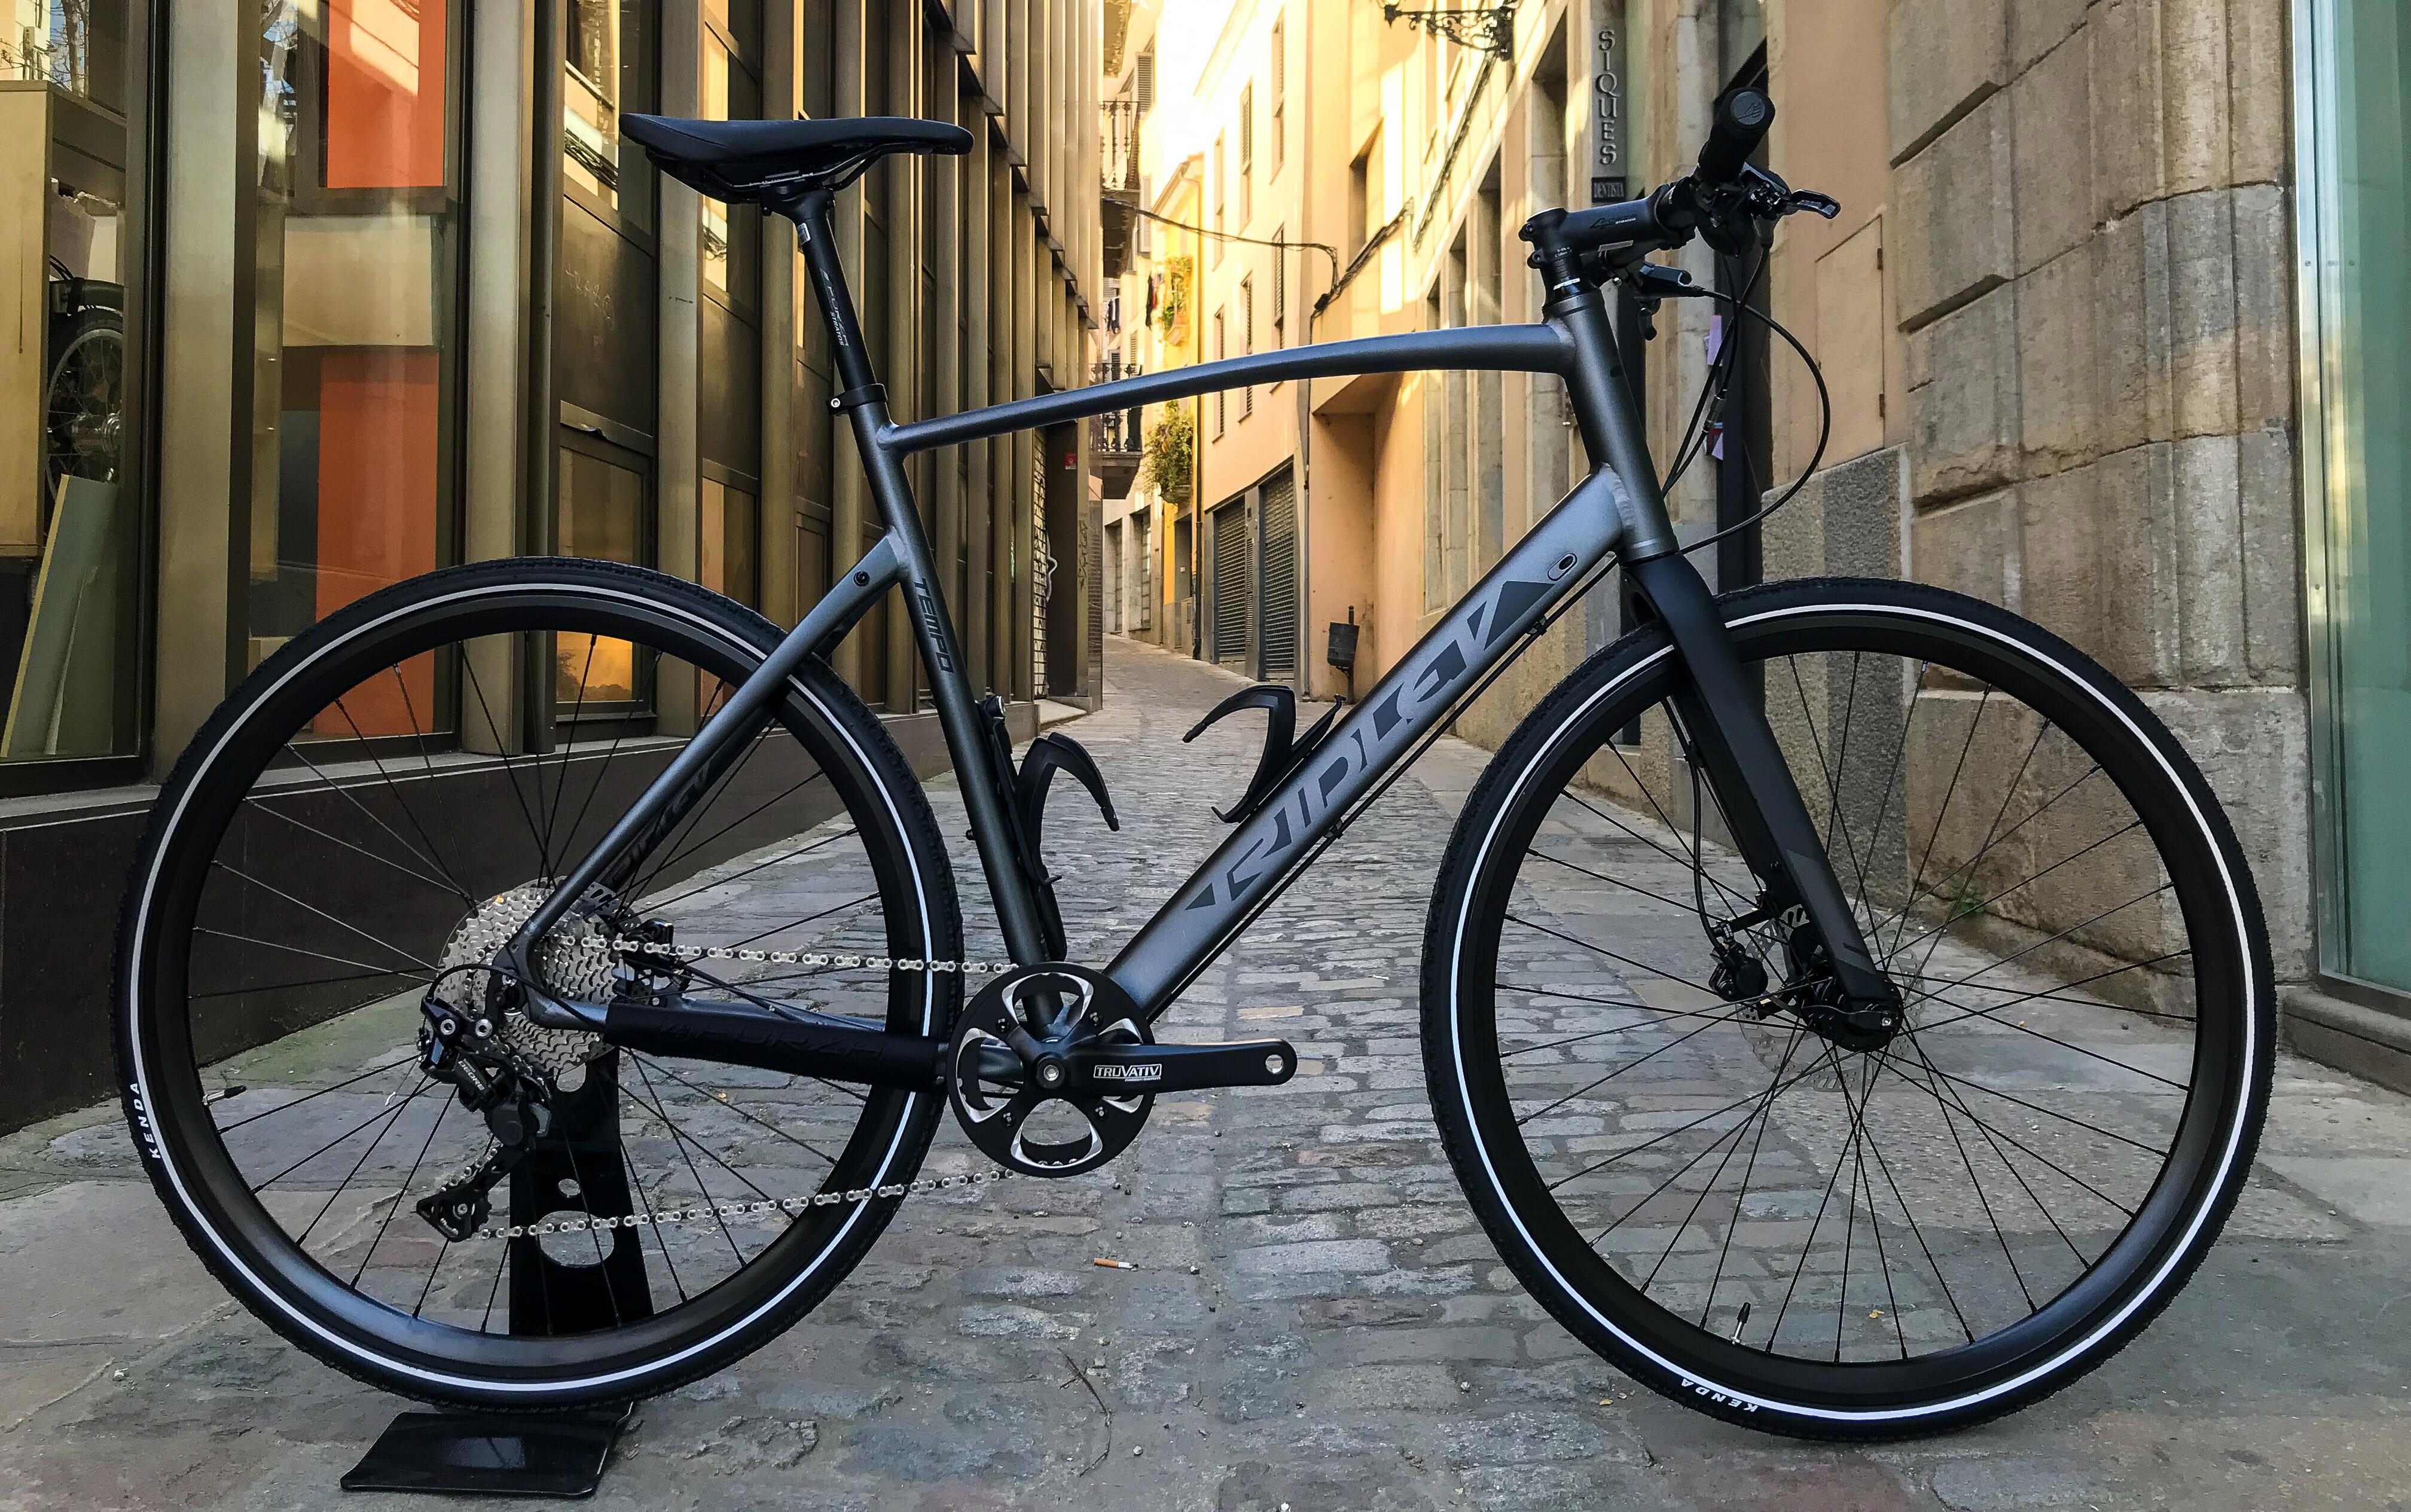 European-Cycling-Vacation-Bike-Rental-Girona-Eat-Sleep-Cycle